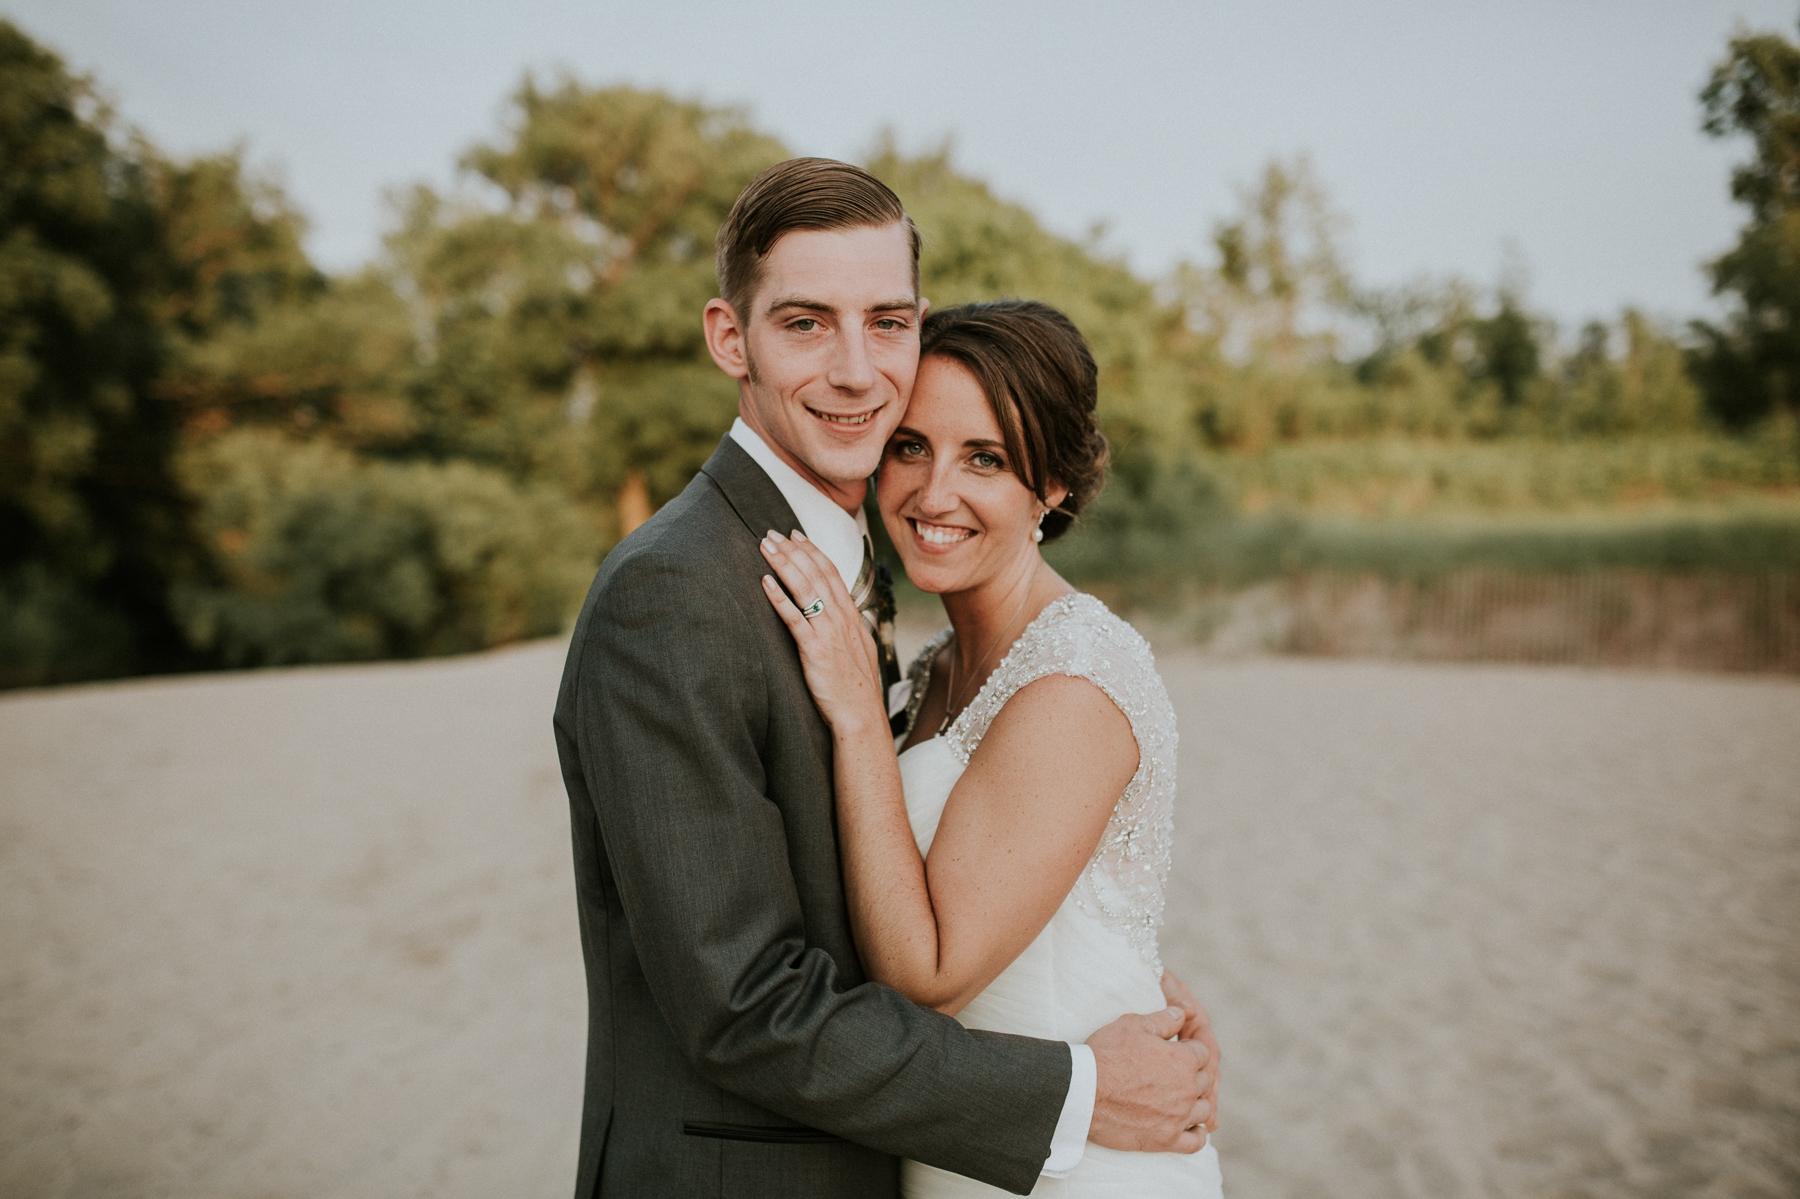 buffalo-new-york-hamburg-beach-wedding-photography 103.jpg